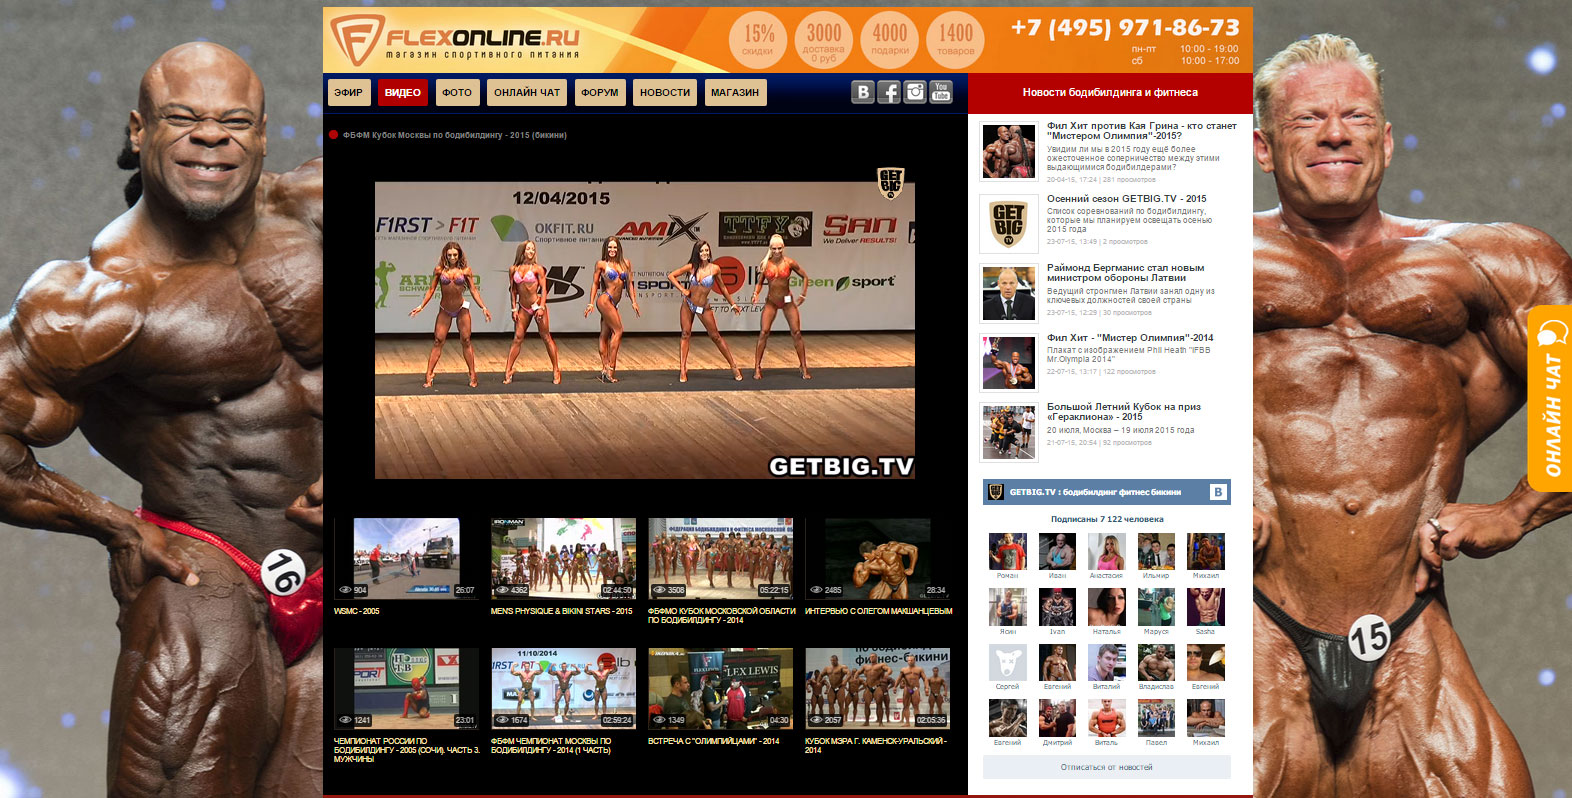 Телеканал GETBIG.TV